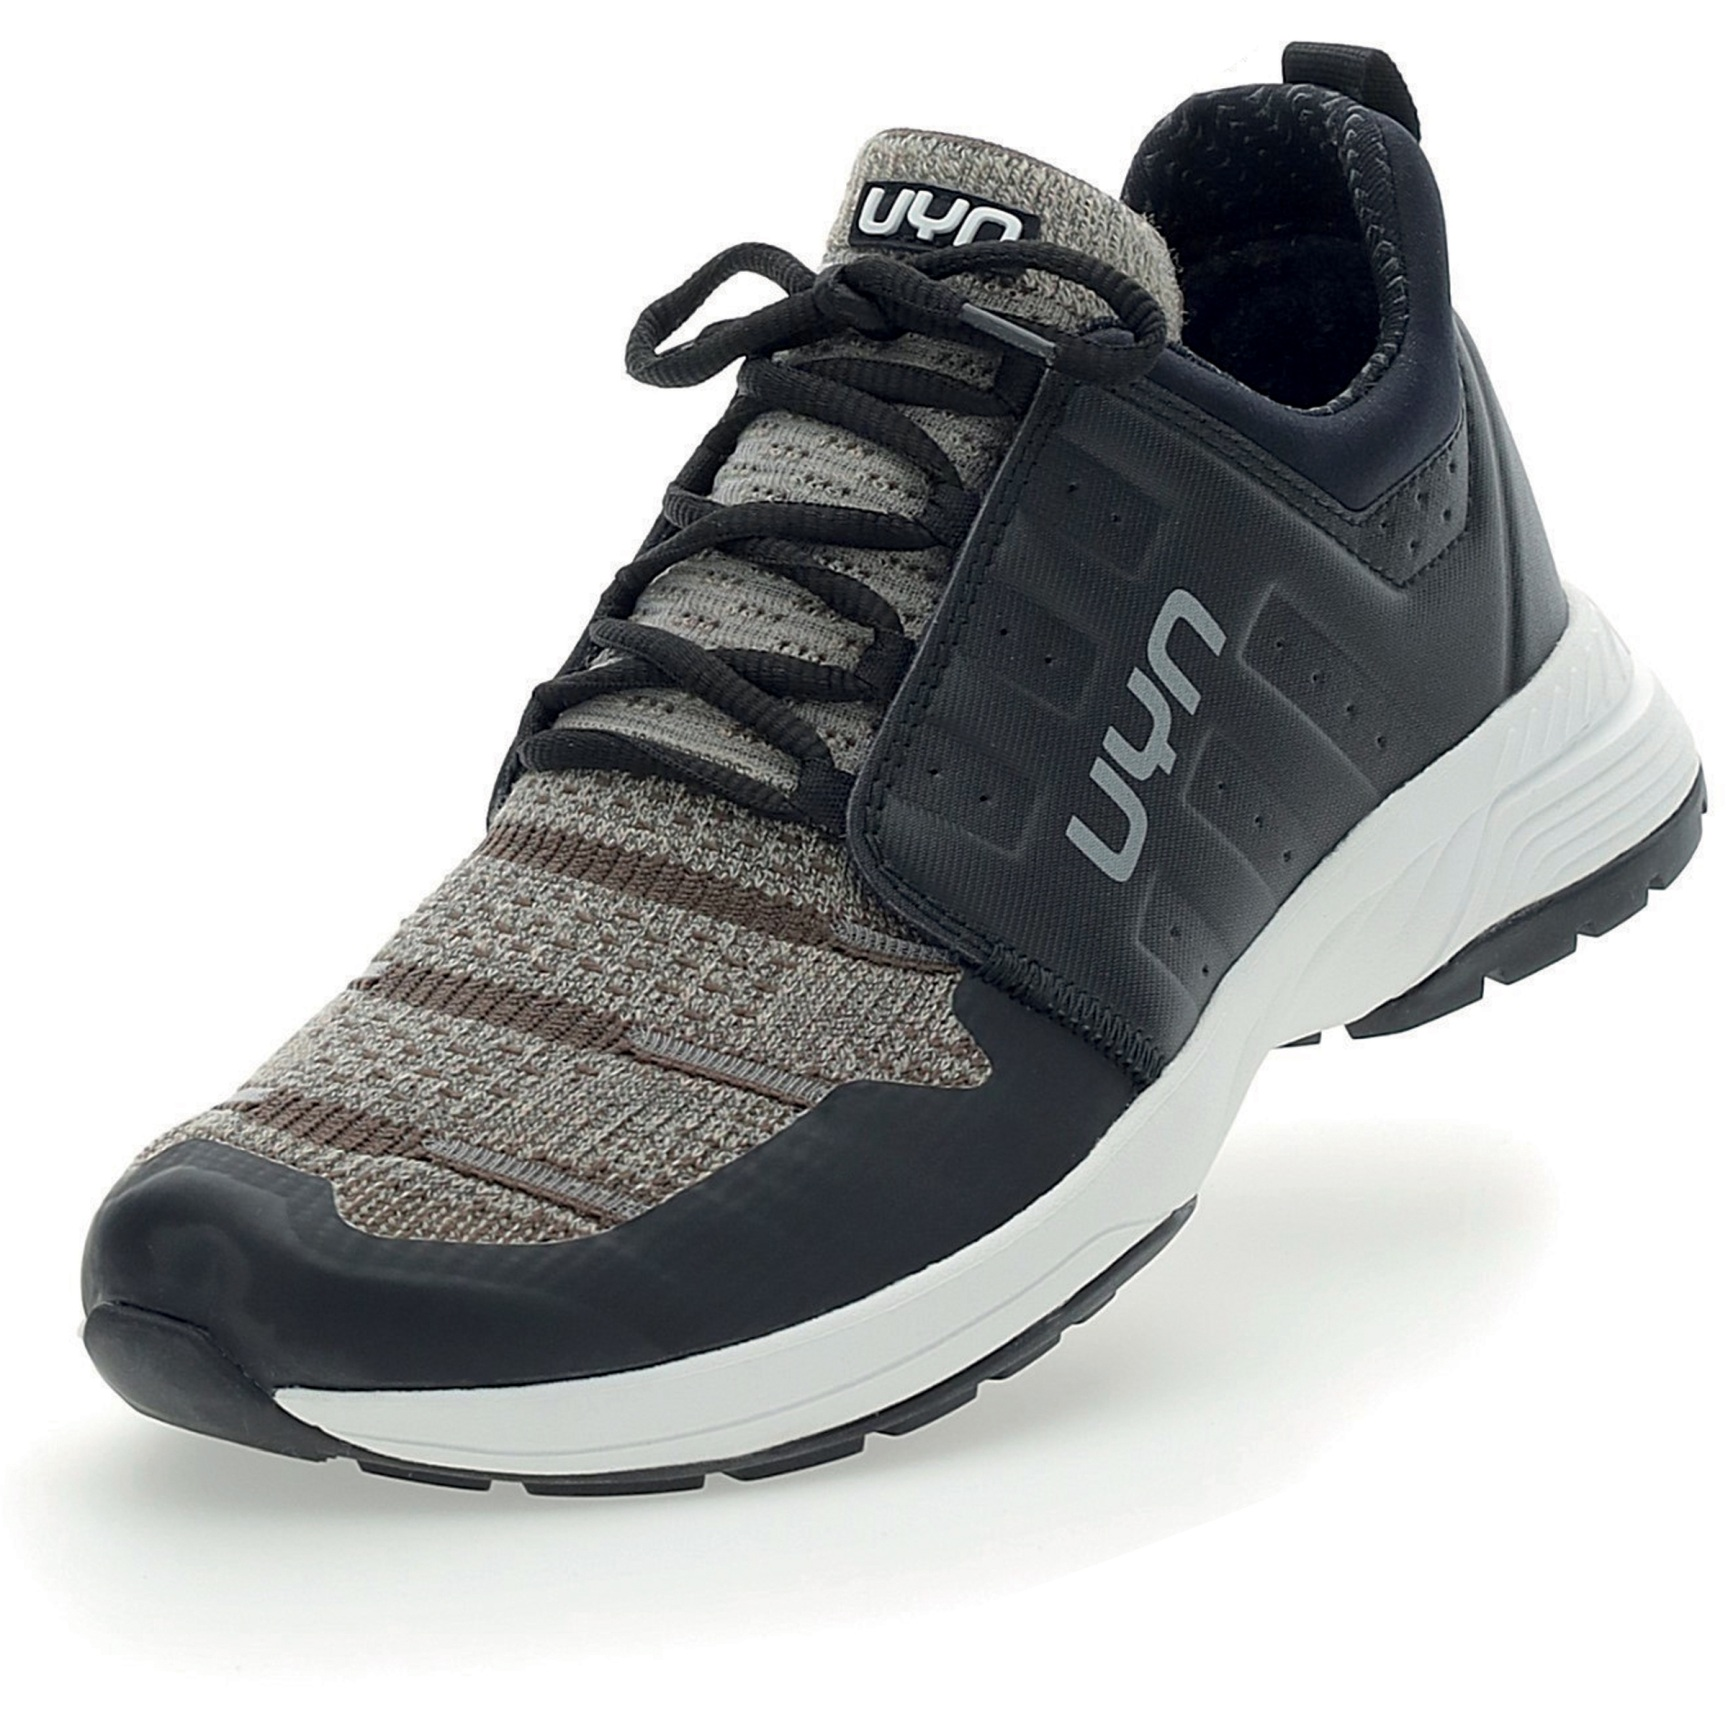 UYN Air Dual EVO Running Shoes - Brown